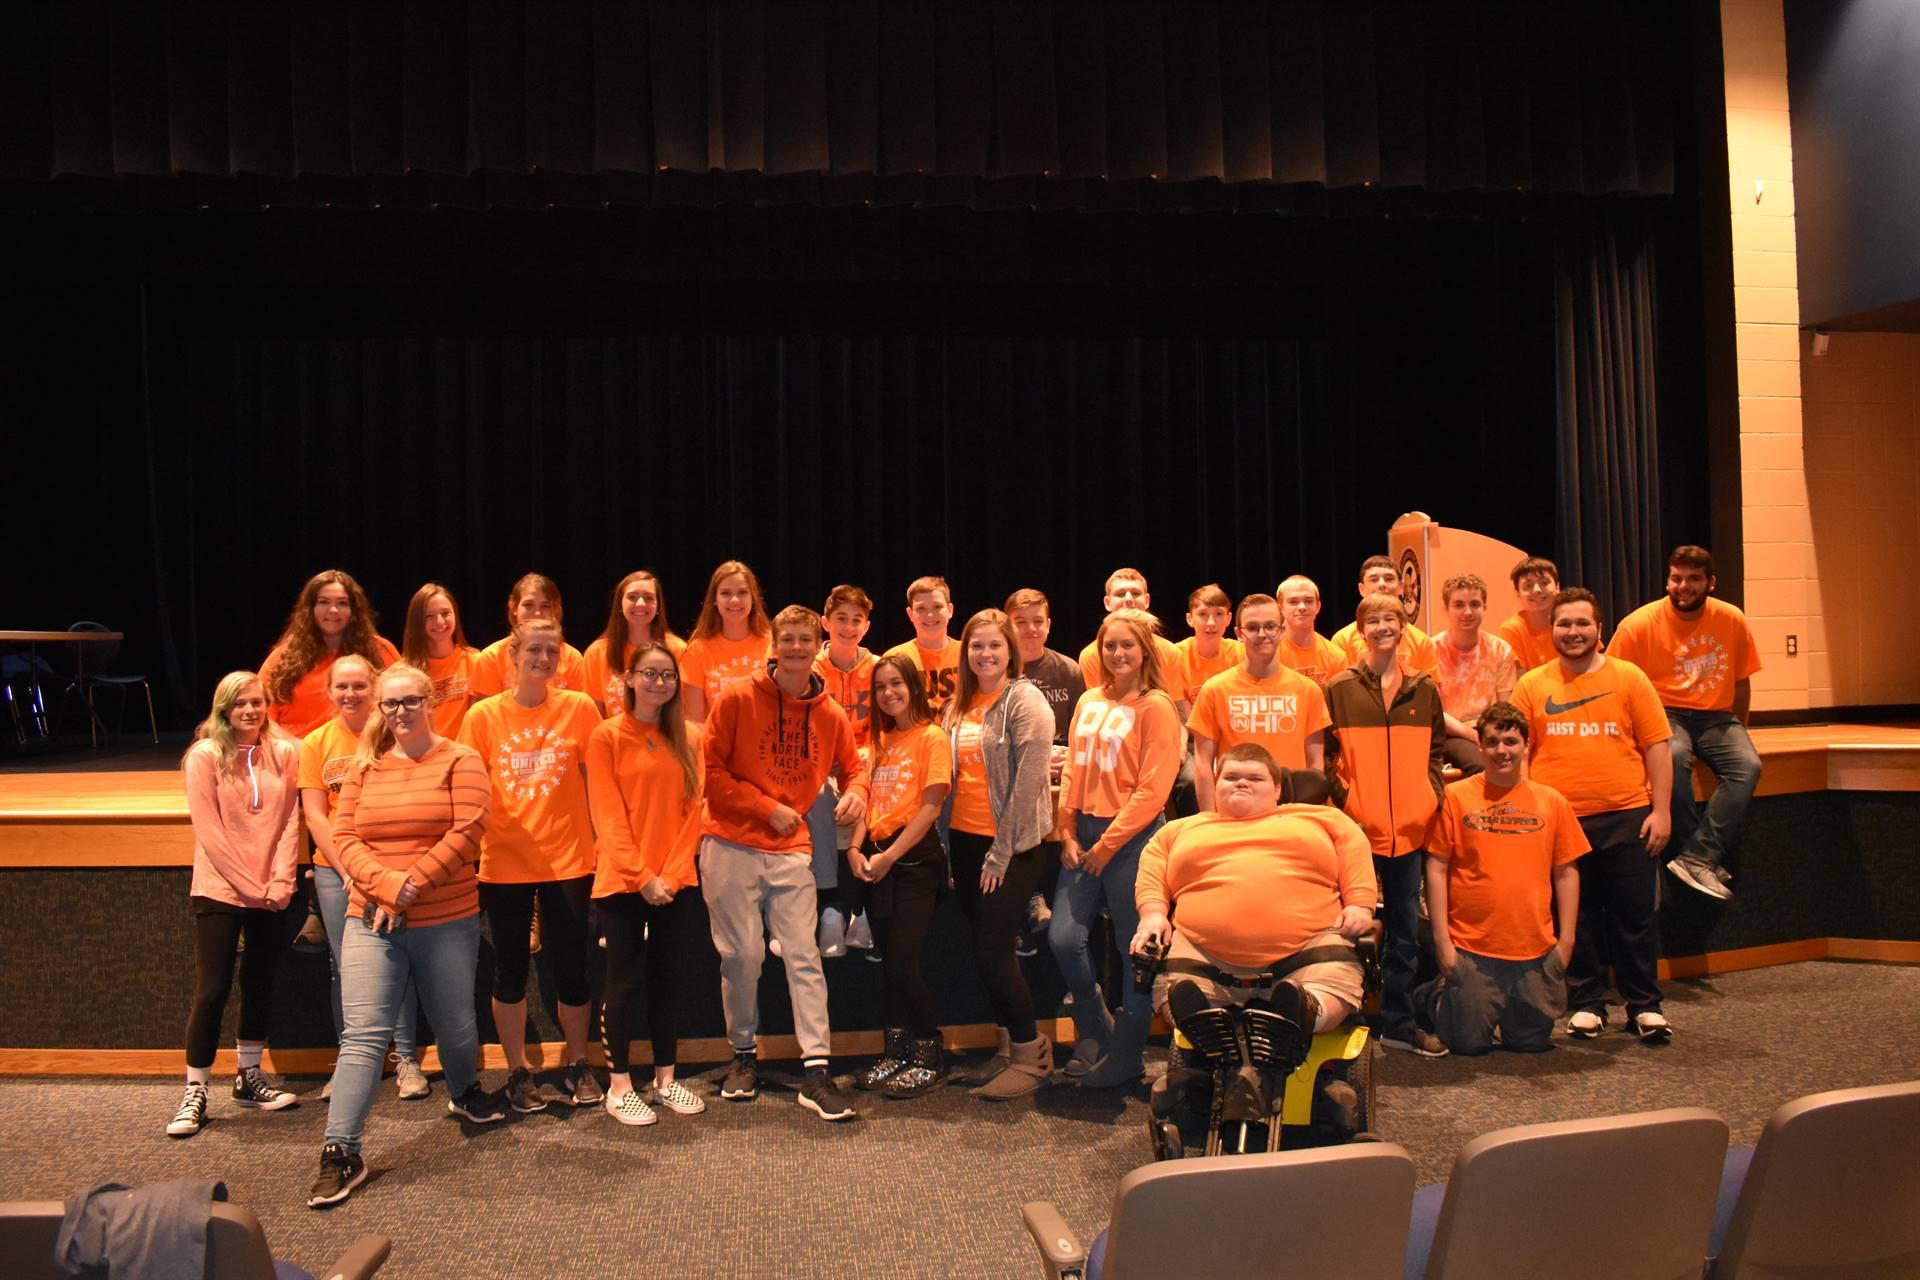 Brookfield Field High School Unity Day